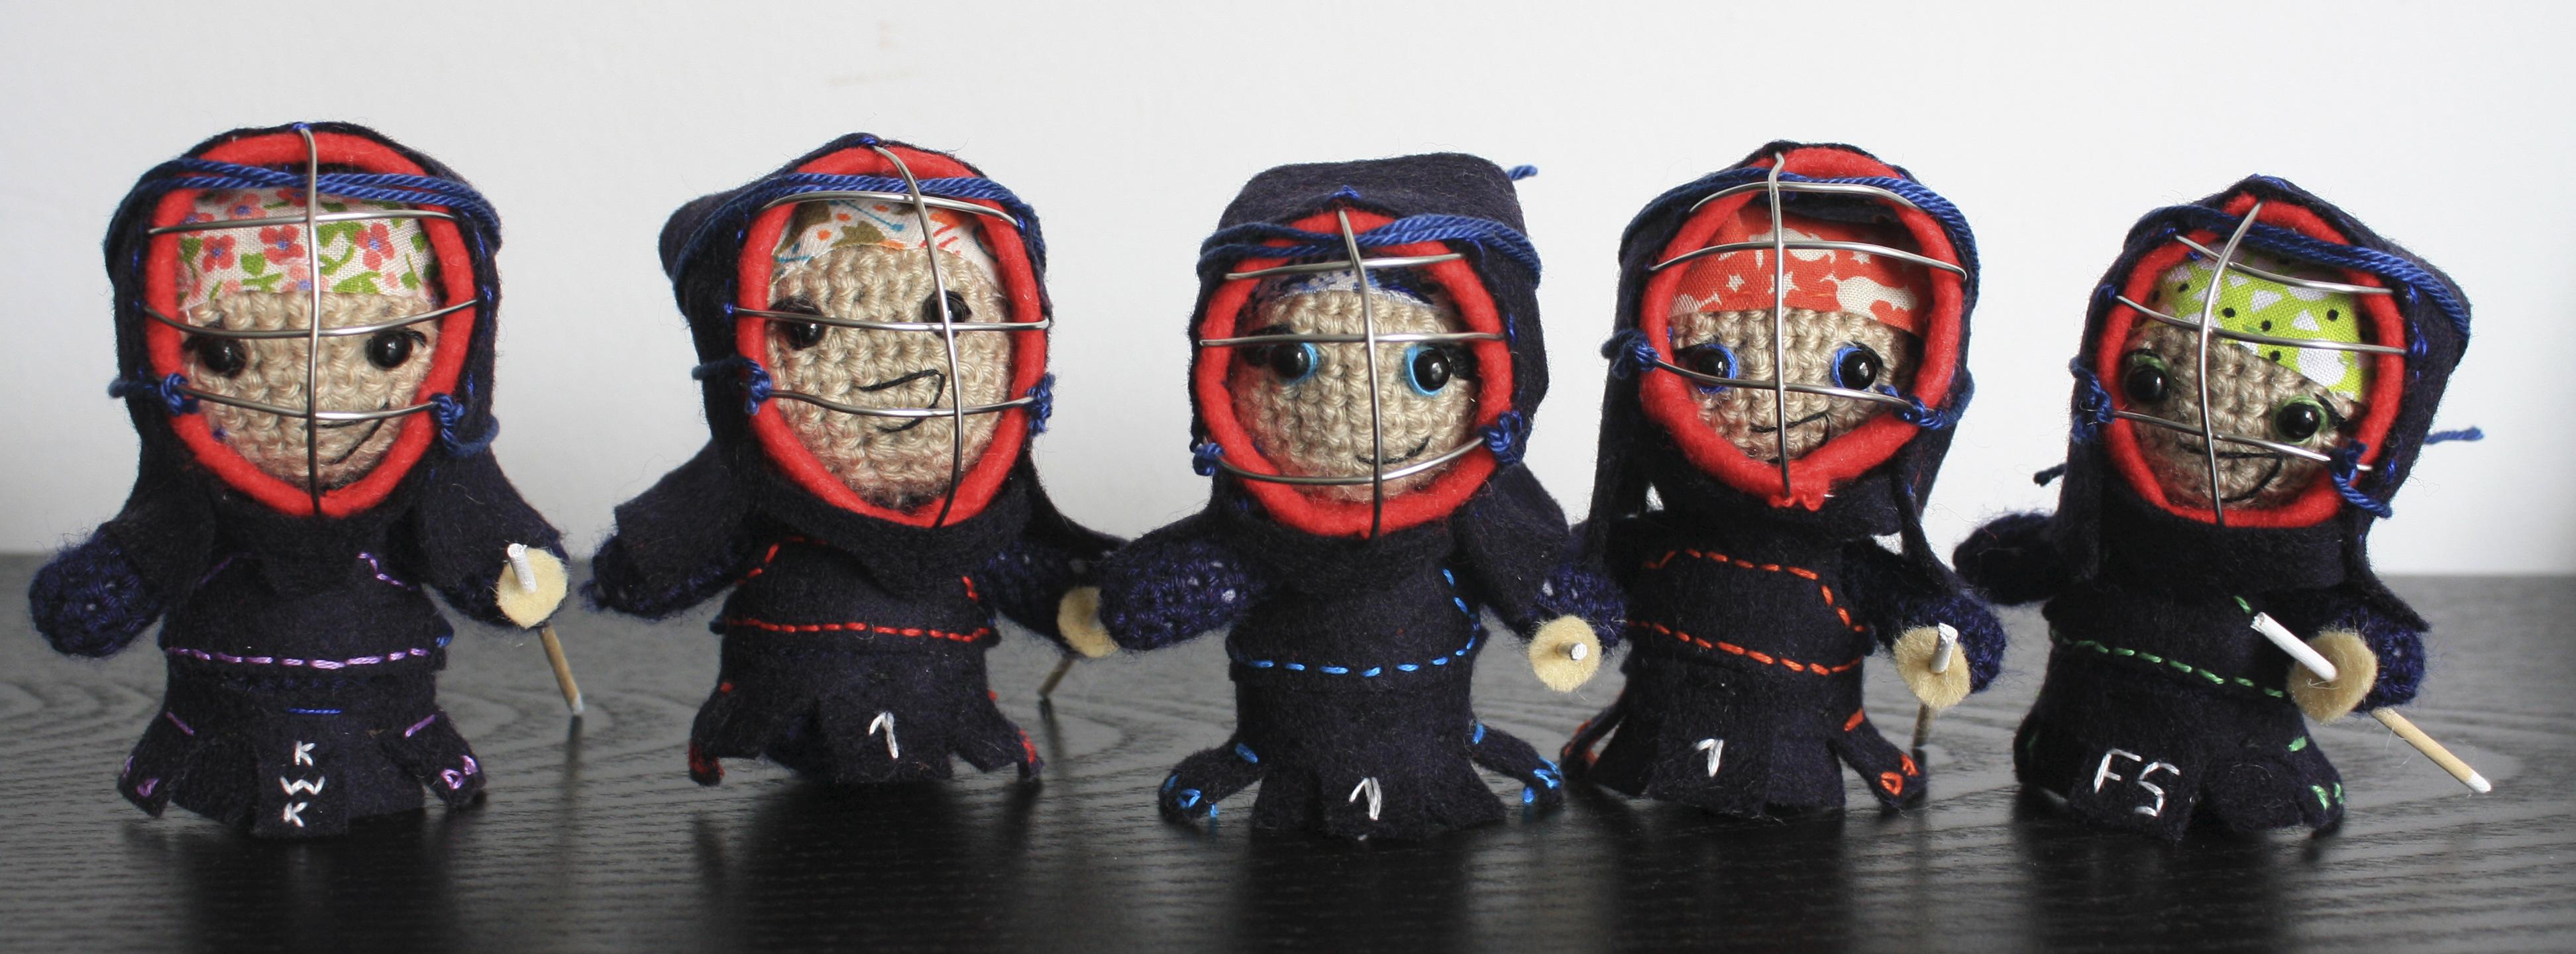 Mujeres Kenshi 2014 - kendo amigurumi by black mambart